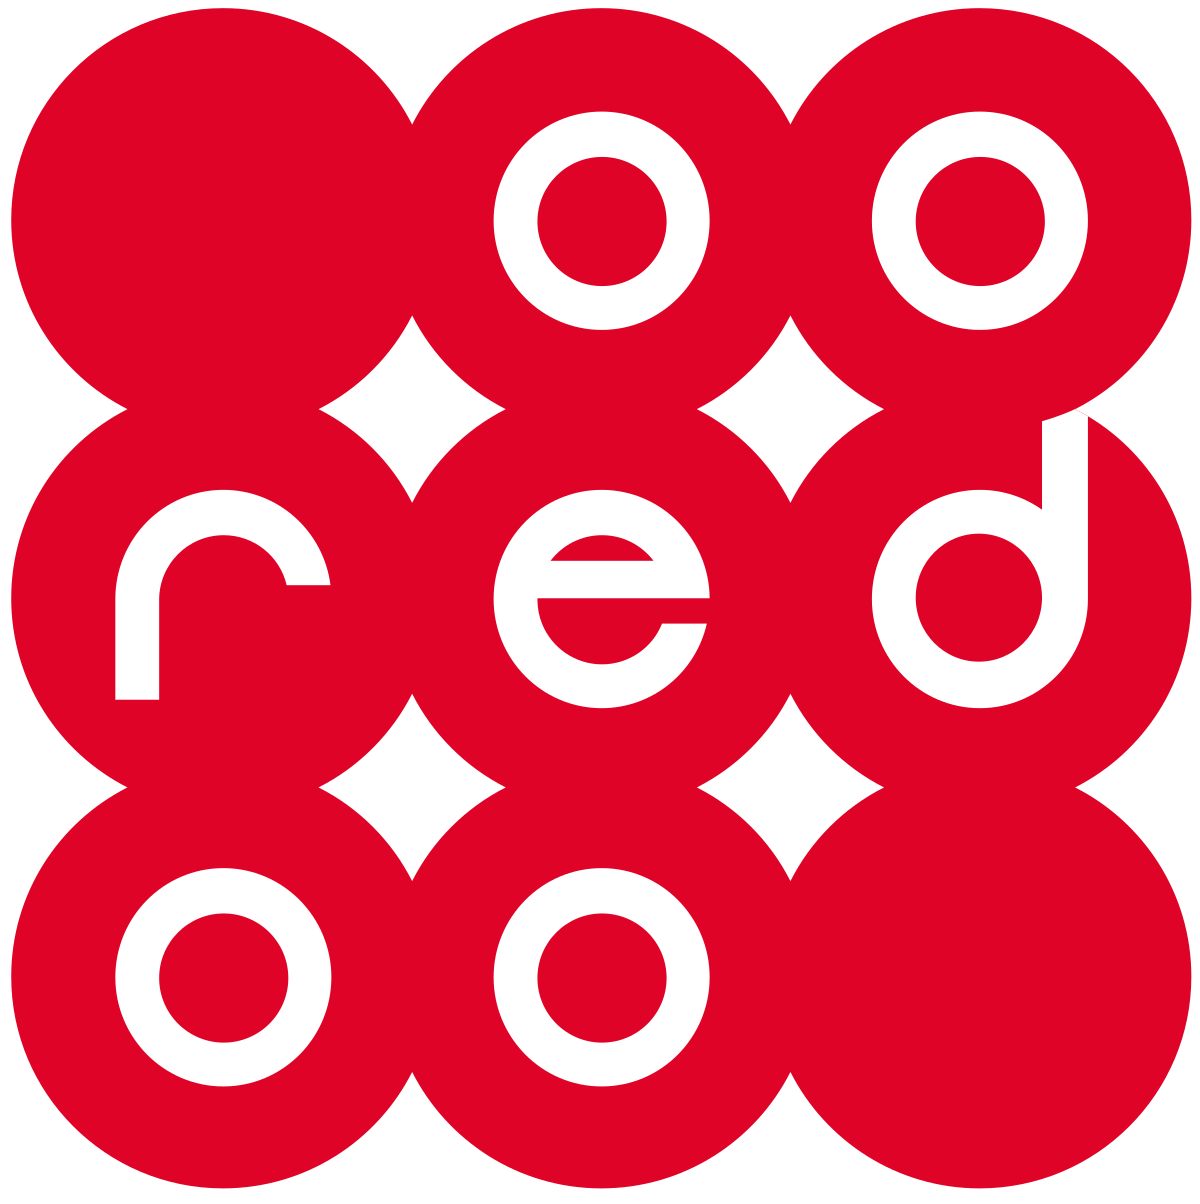 Télécharger photo ooredoo logo transparent png